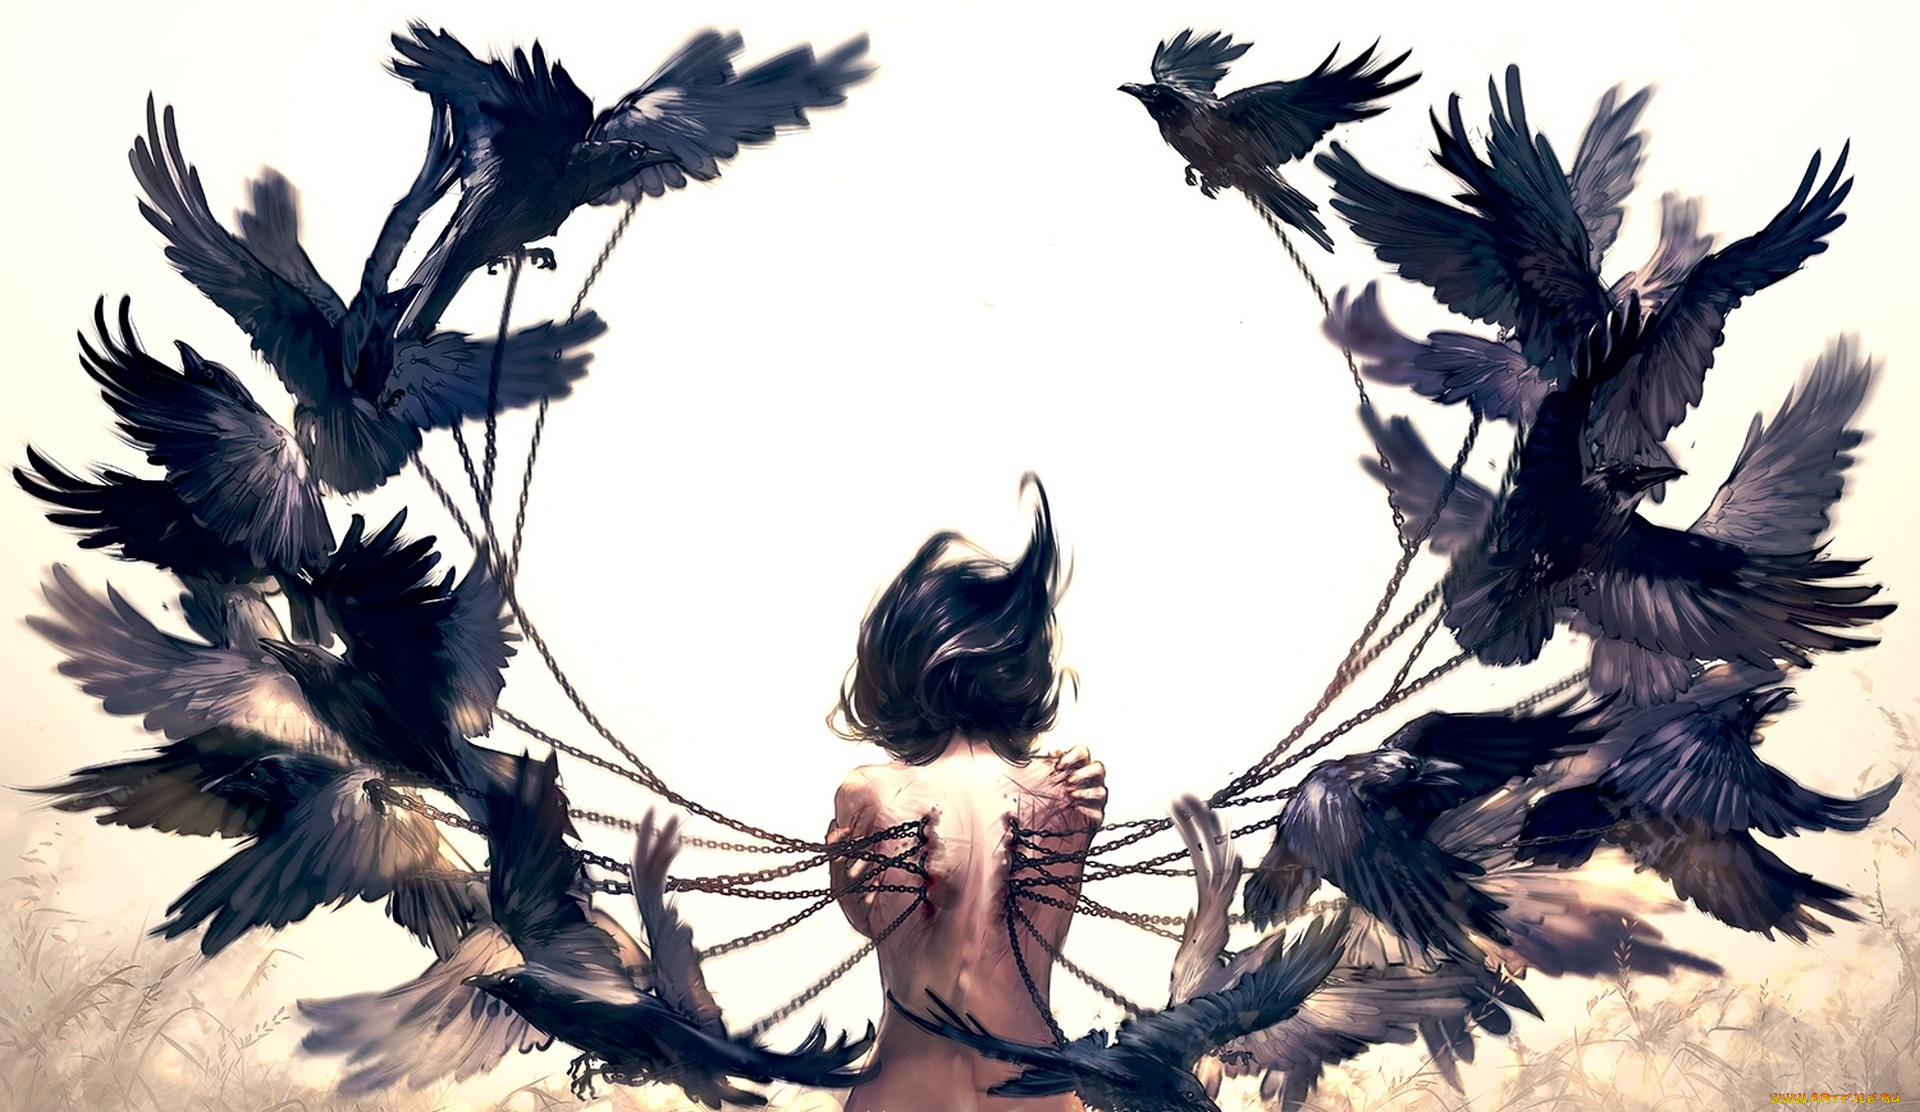 https://i.artfile.me/wallpaper/17-10-2015/1920x1112/anime-angely--demony-voron-spina-krov-we-978855.jpg